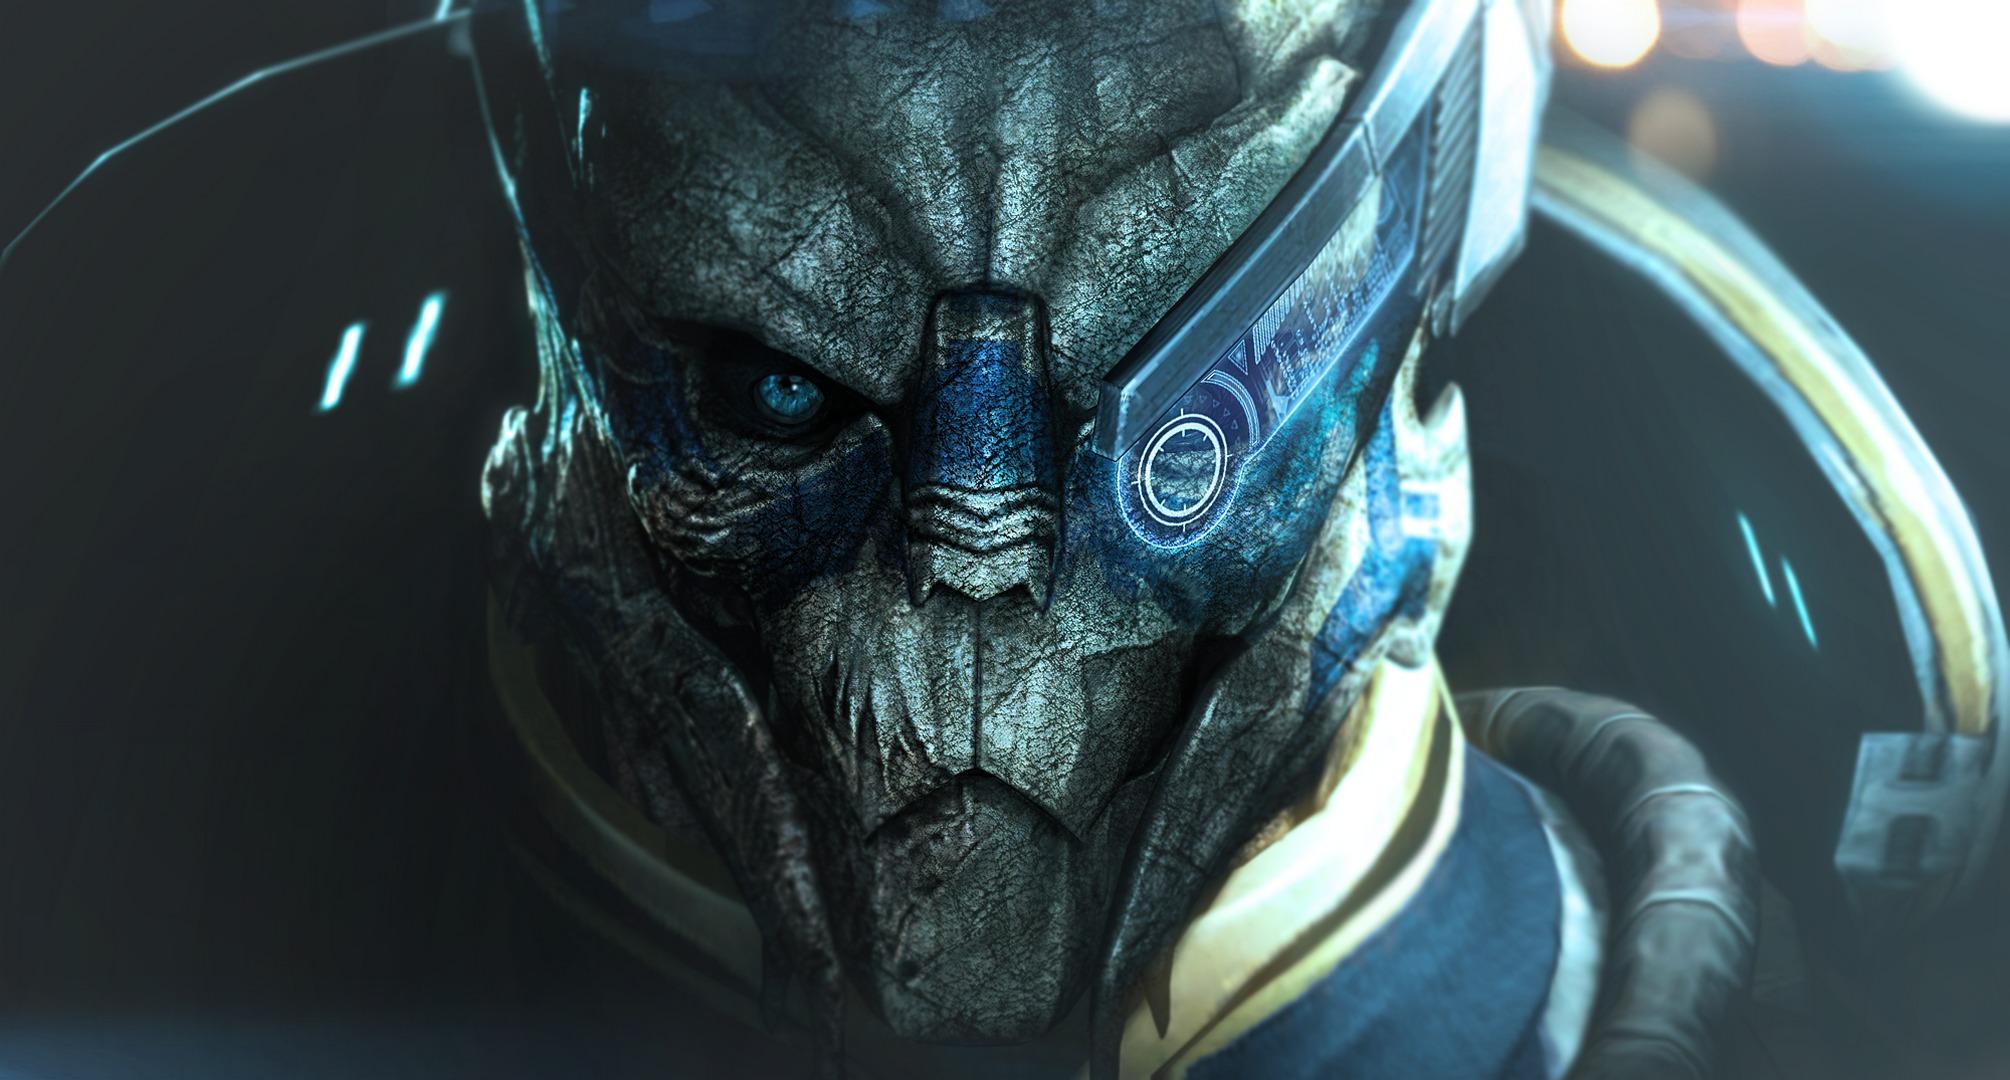 Mass Effect Garrus Wallpapers HD Desktop ImageBankbiz 2010x1080